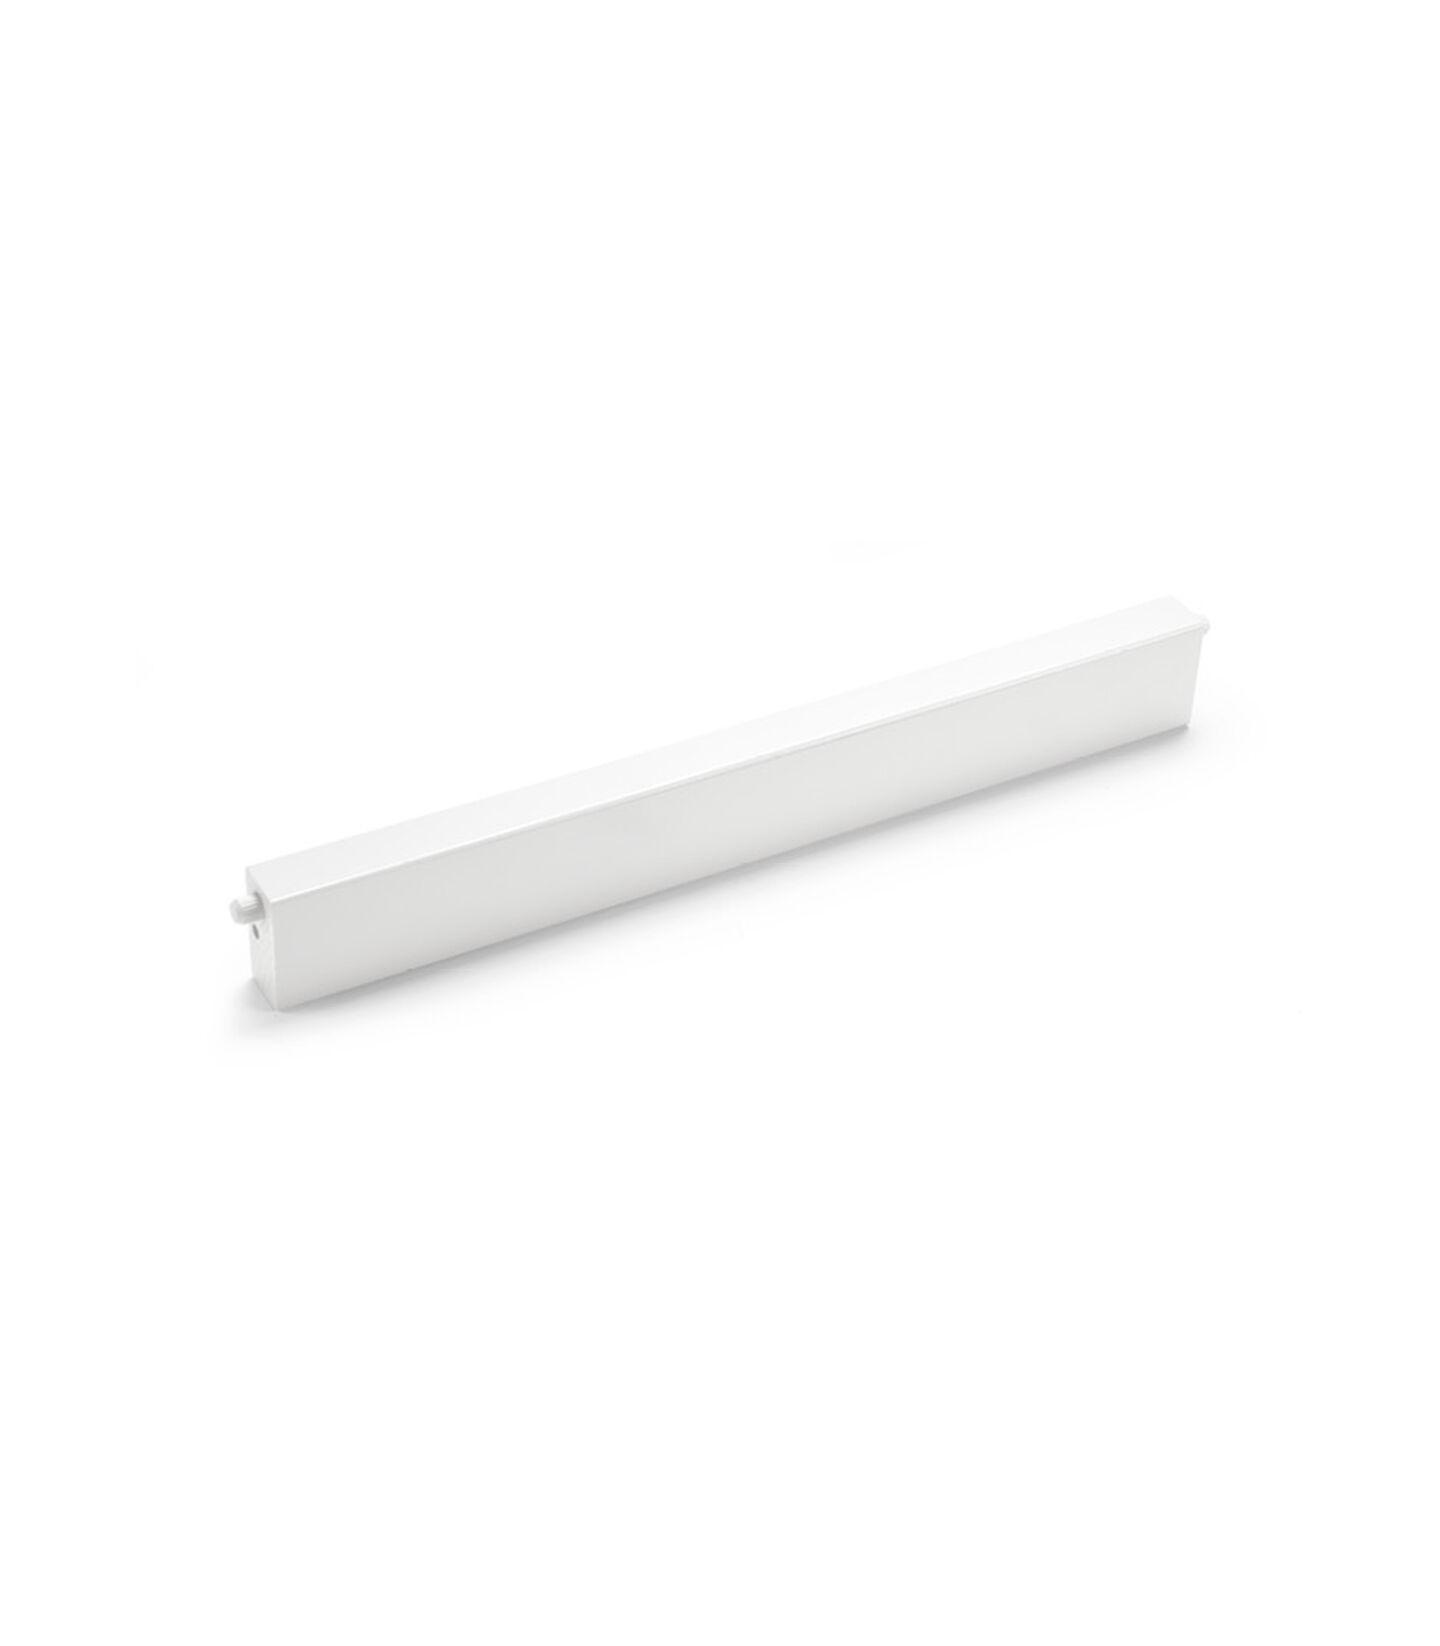 Tripp Trapp® Floorbrace Blanco, Blanco, mainview view 2